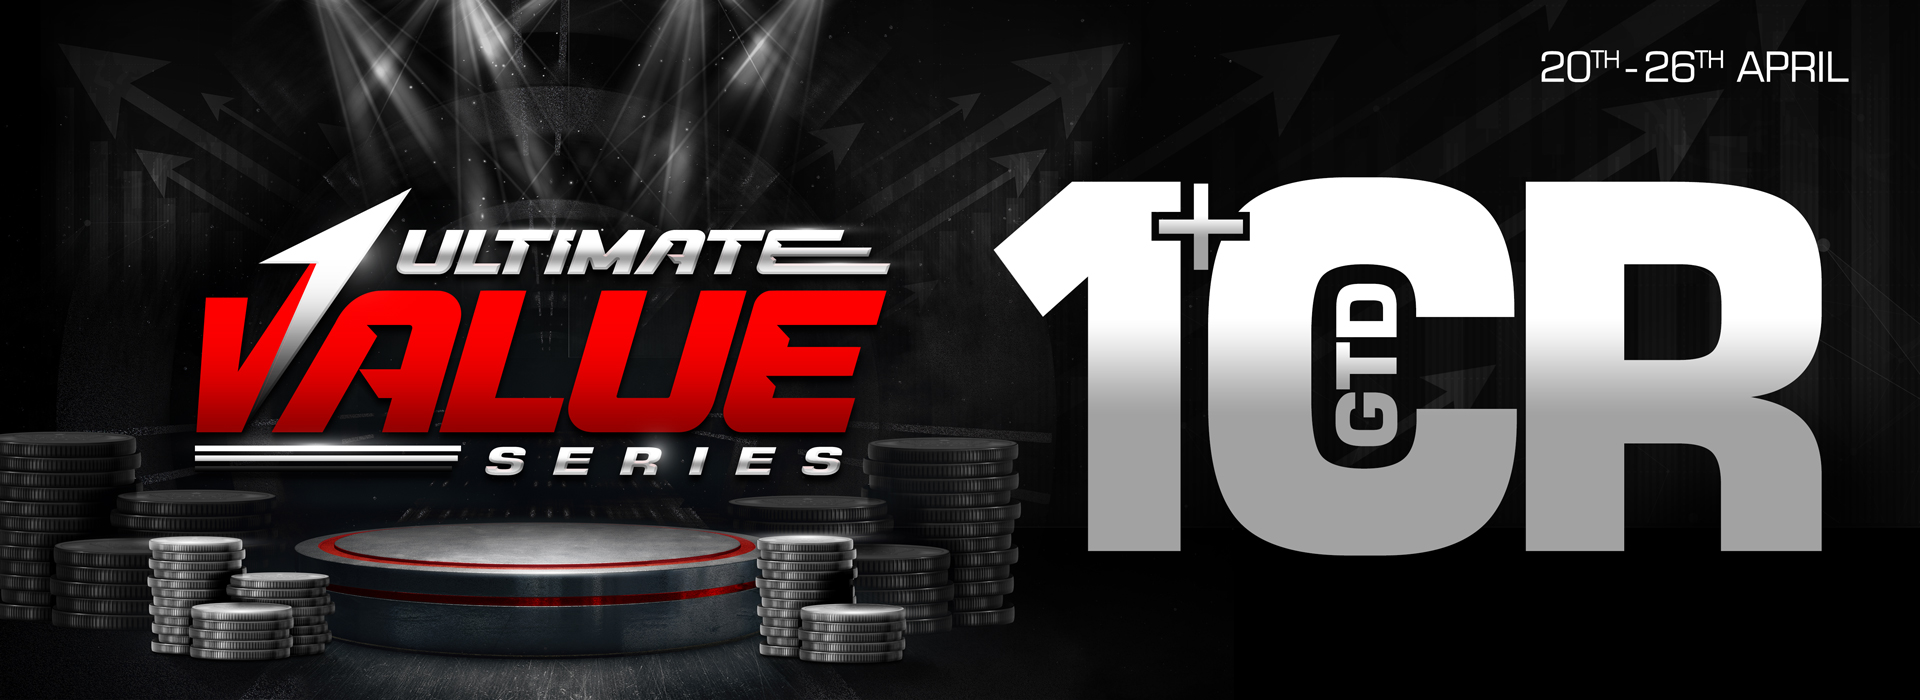 ultimate series